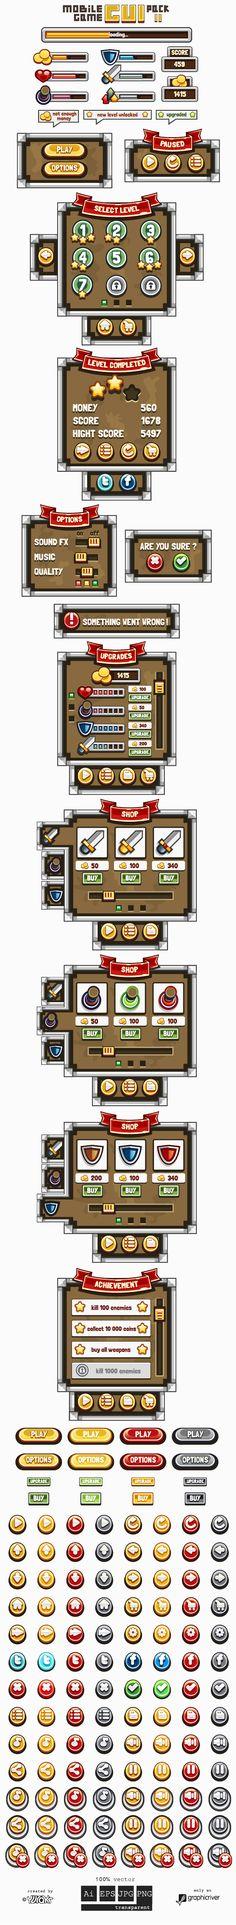 Mobile Game GUI Pack...@白幽游采集到GAME-UI(1266图)_花瓣游戏